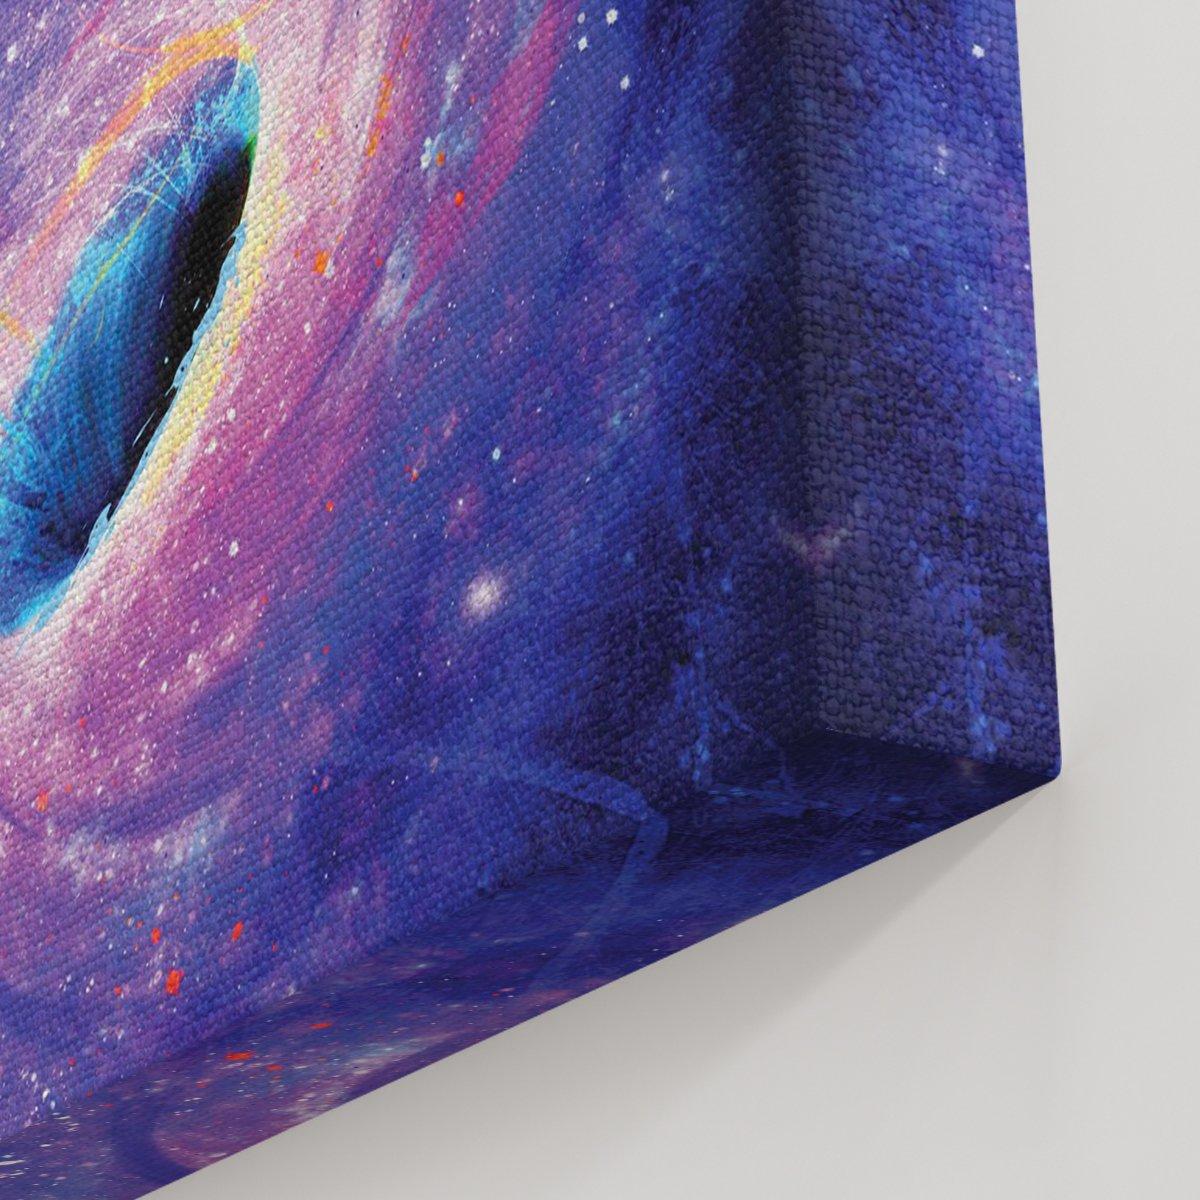 Uzay Boşluğunda Bir Astronot Kanvas Tablo